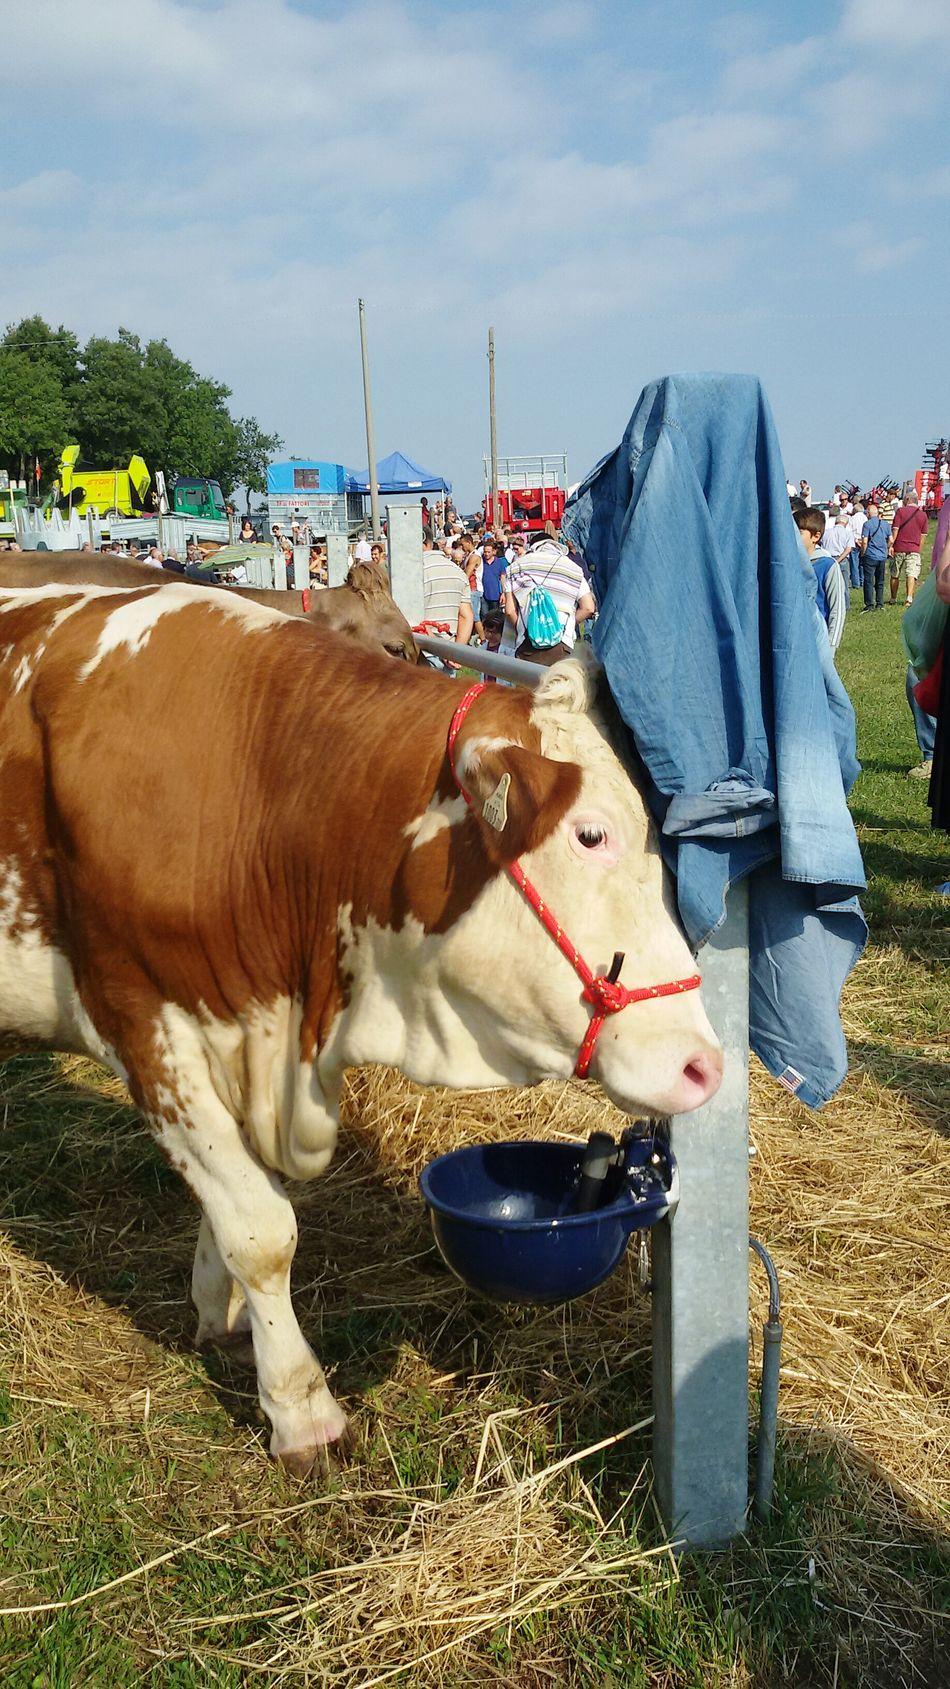 Animal Themes Herbivorous Rural Scene Mucca